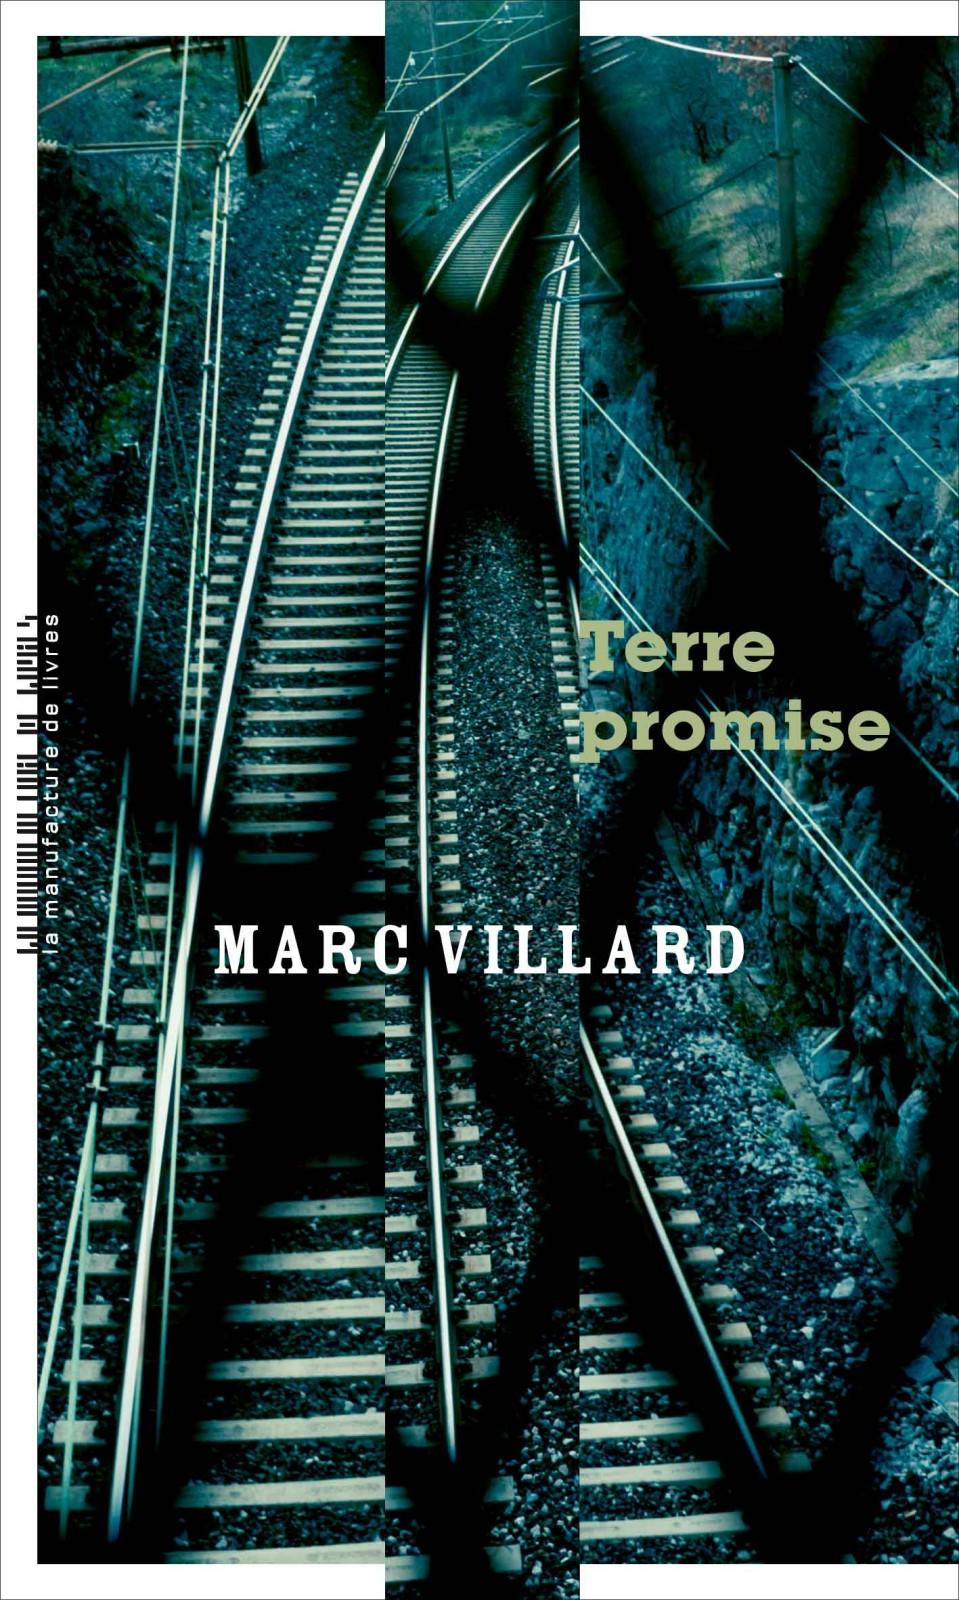 Terre promise | Villard, Marc. Auteur